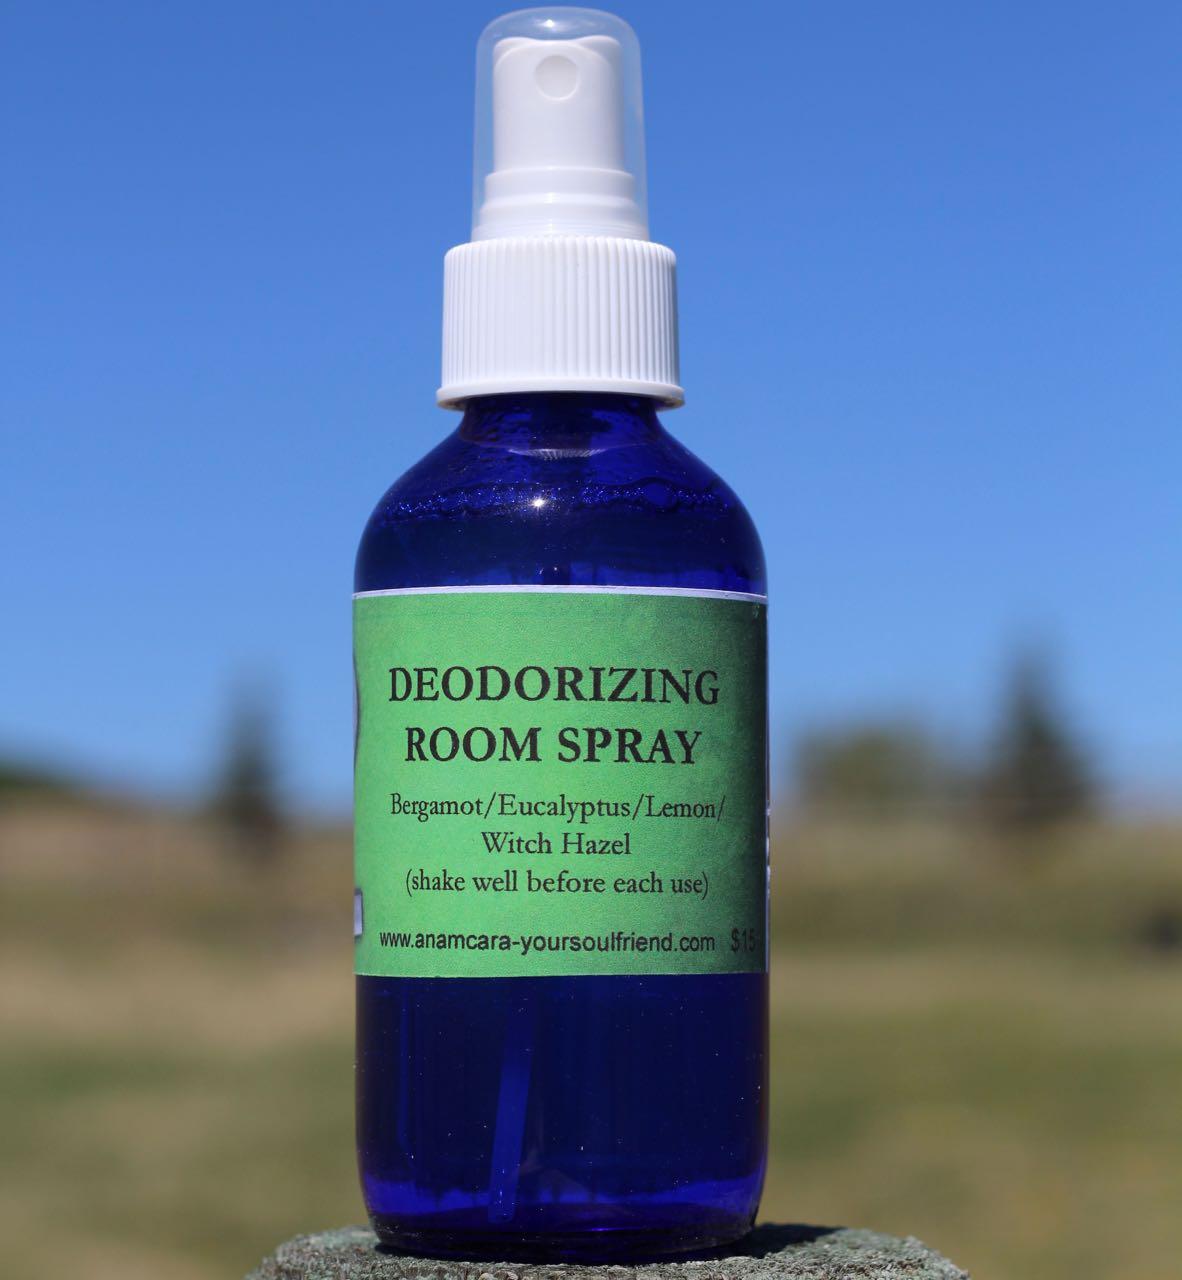 Deodorizing Room Spray Cara Marshall